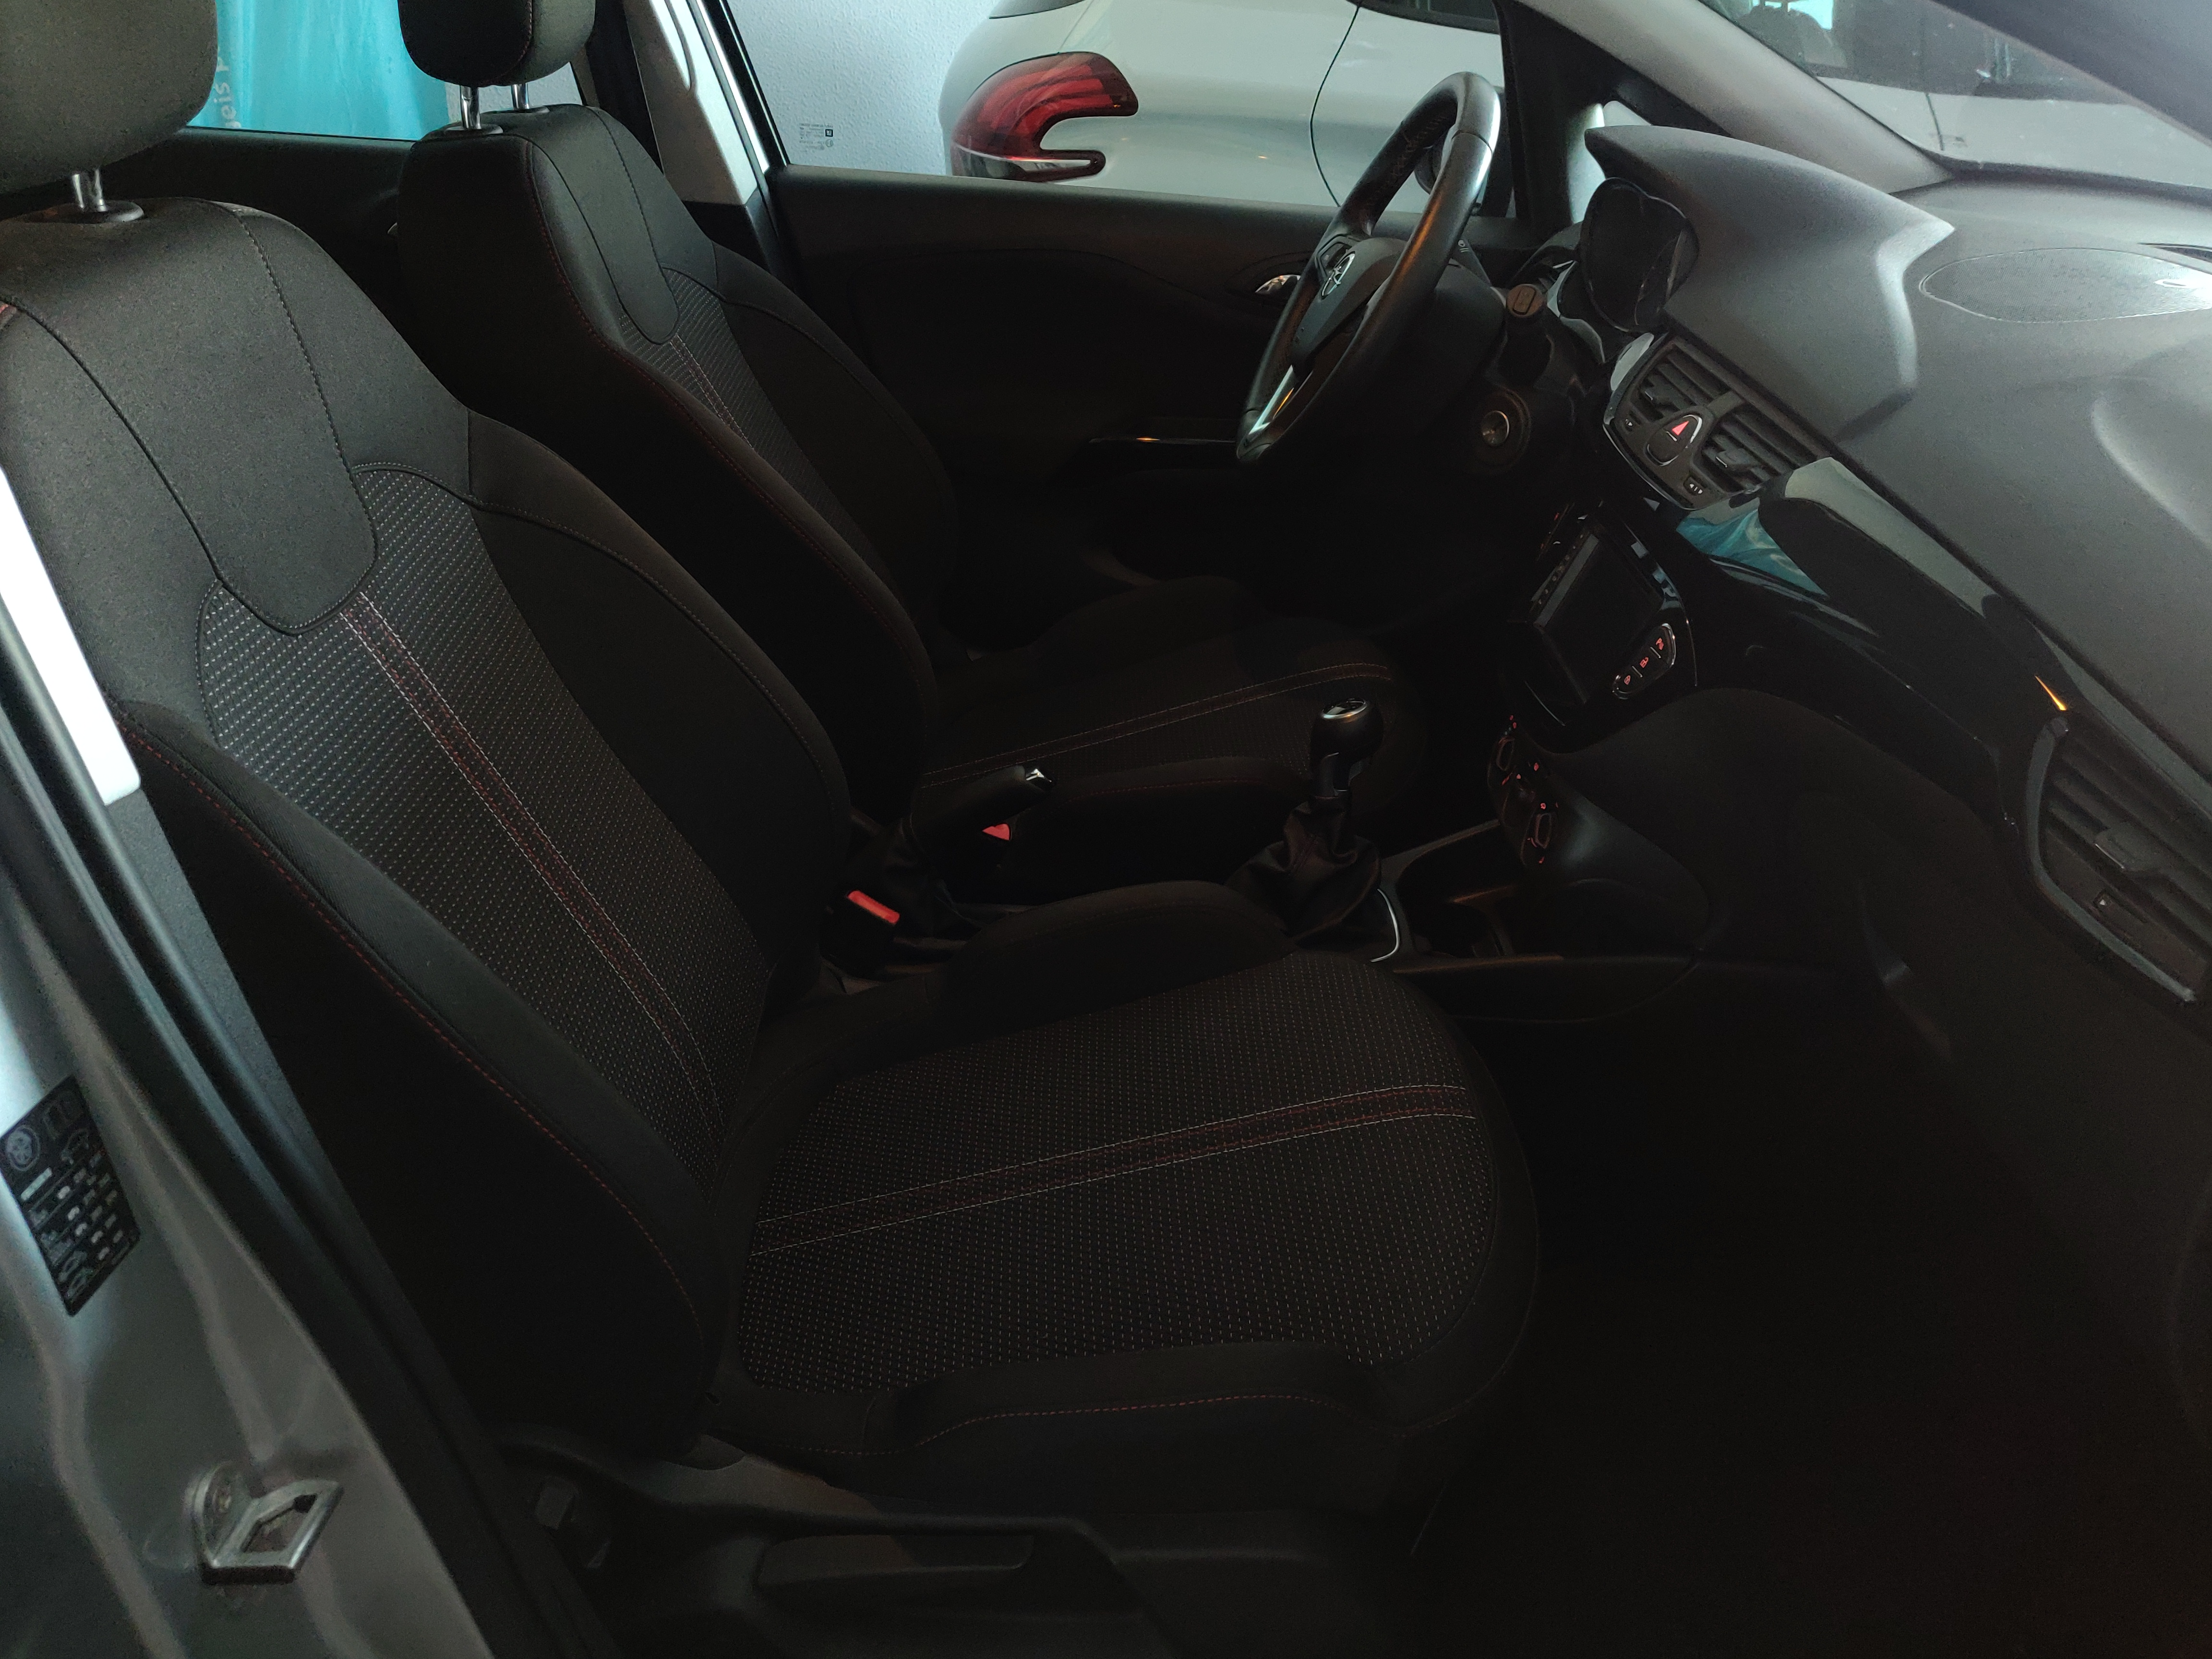 Opel Corsa 1.3 Color Edition | Imagem 12